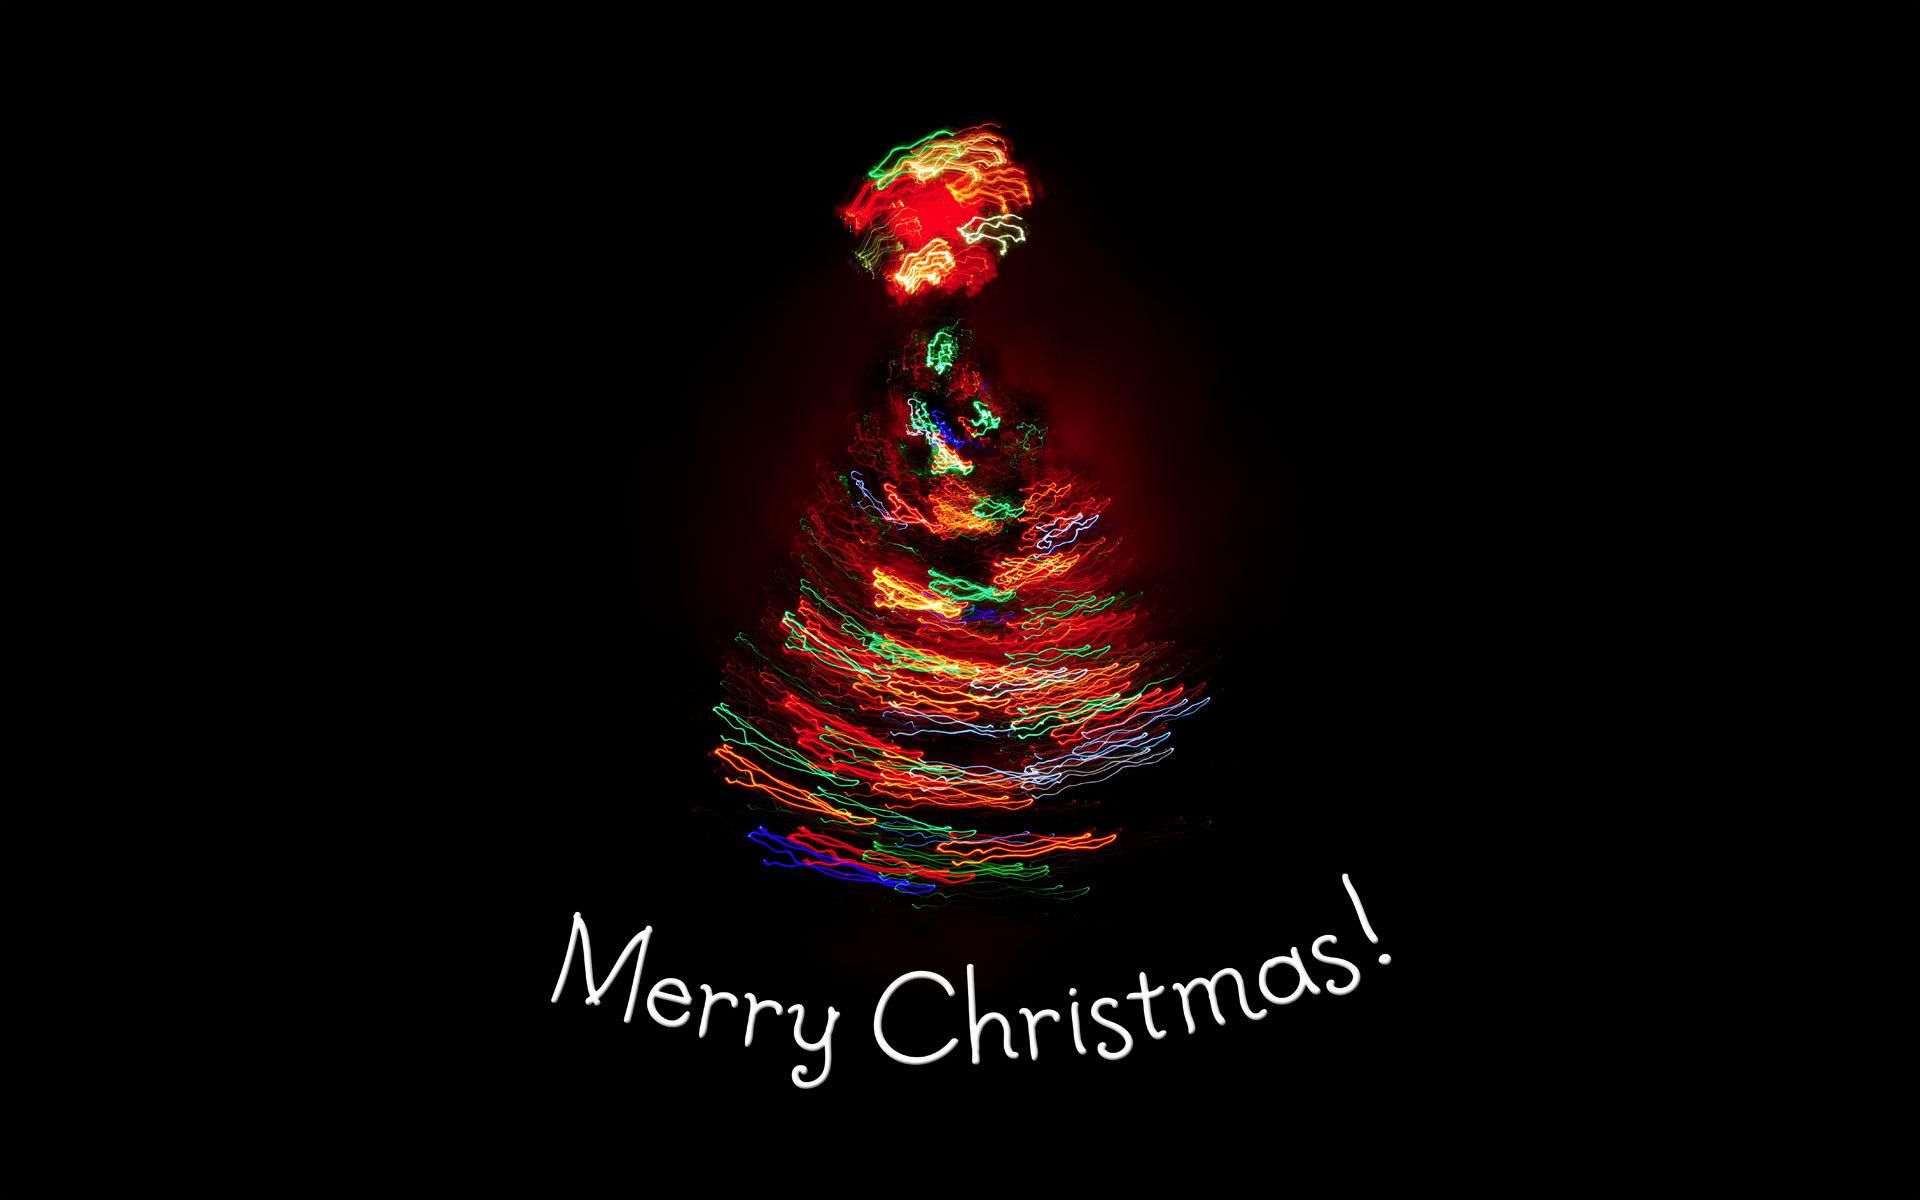 Sfondo Natalizio - Sfondo Desktop Merry Christmas